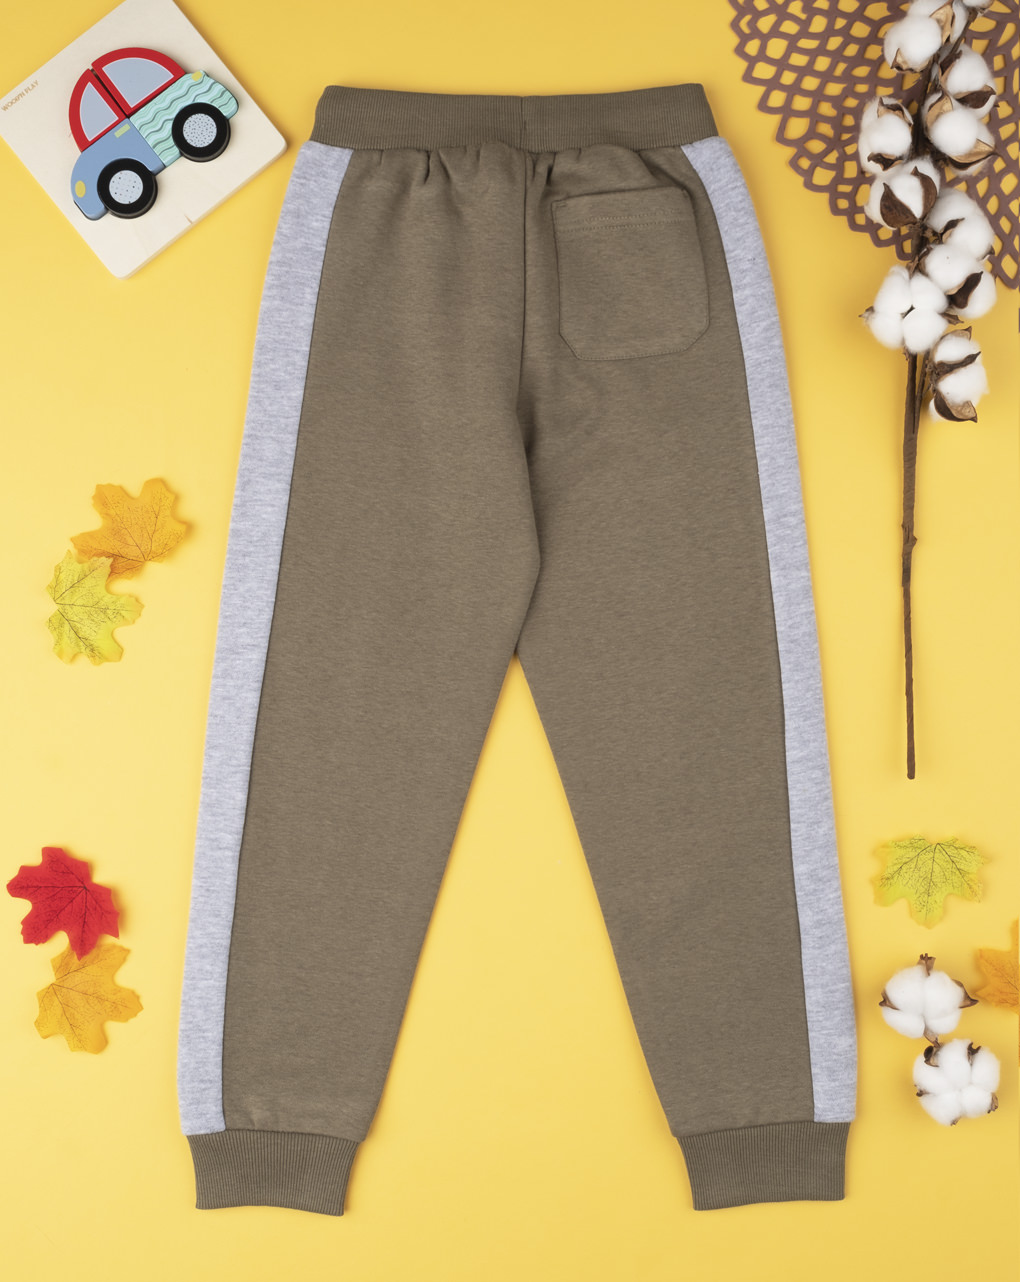 Pantalone boy verde con stripes - Prénatal